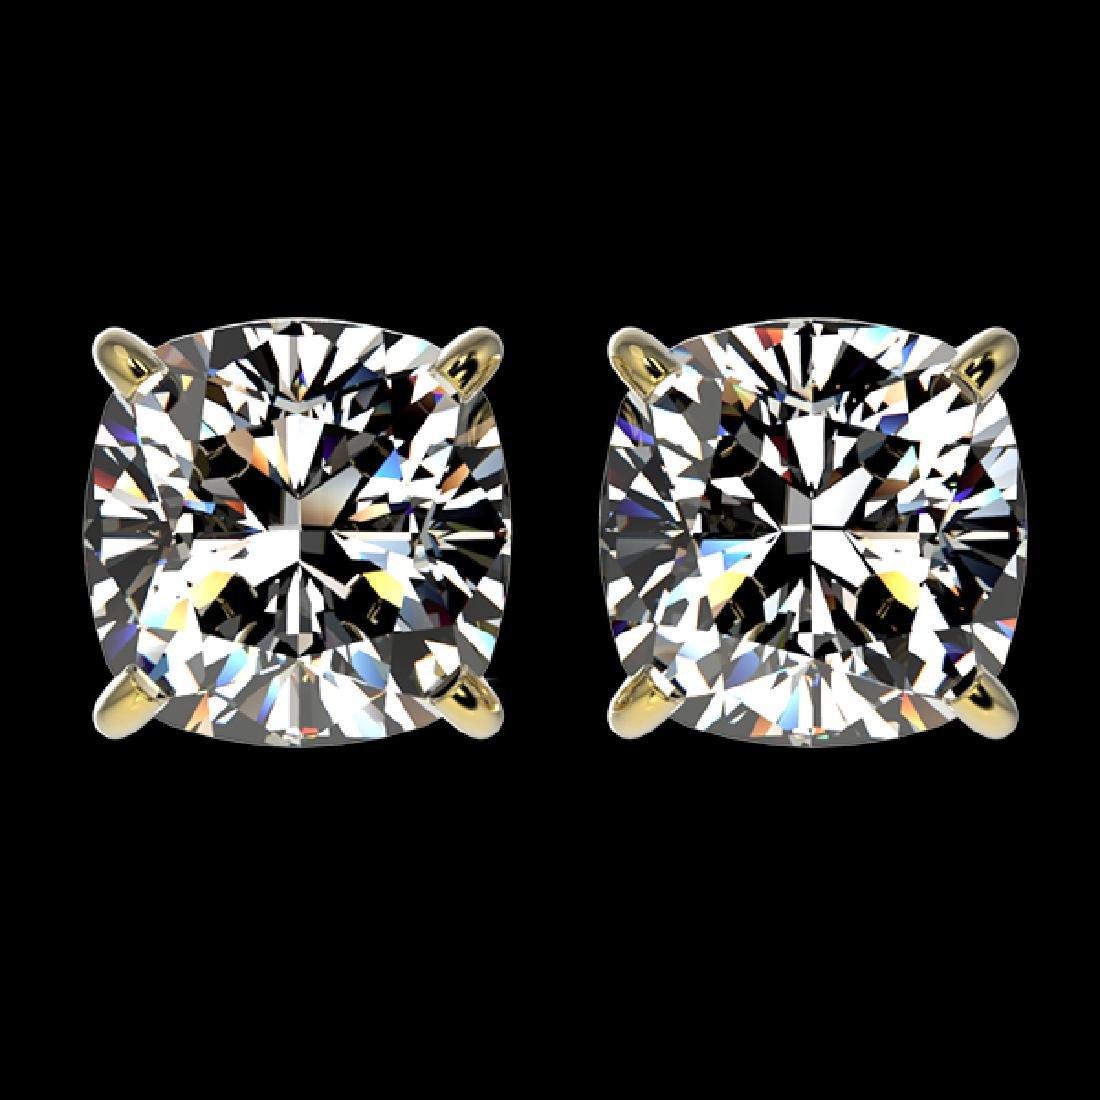 2 CTW Certified VS/SI Quality Cushion Cut Diamond Stud